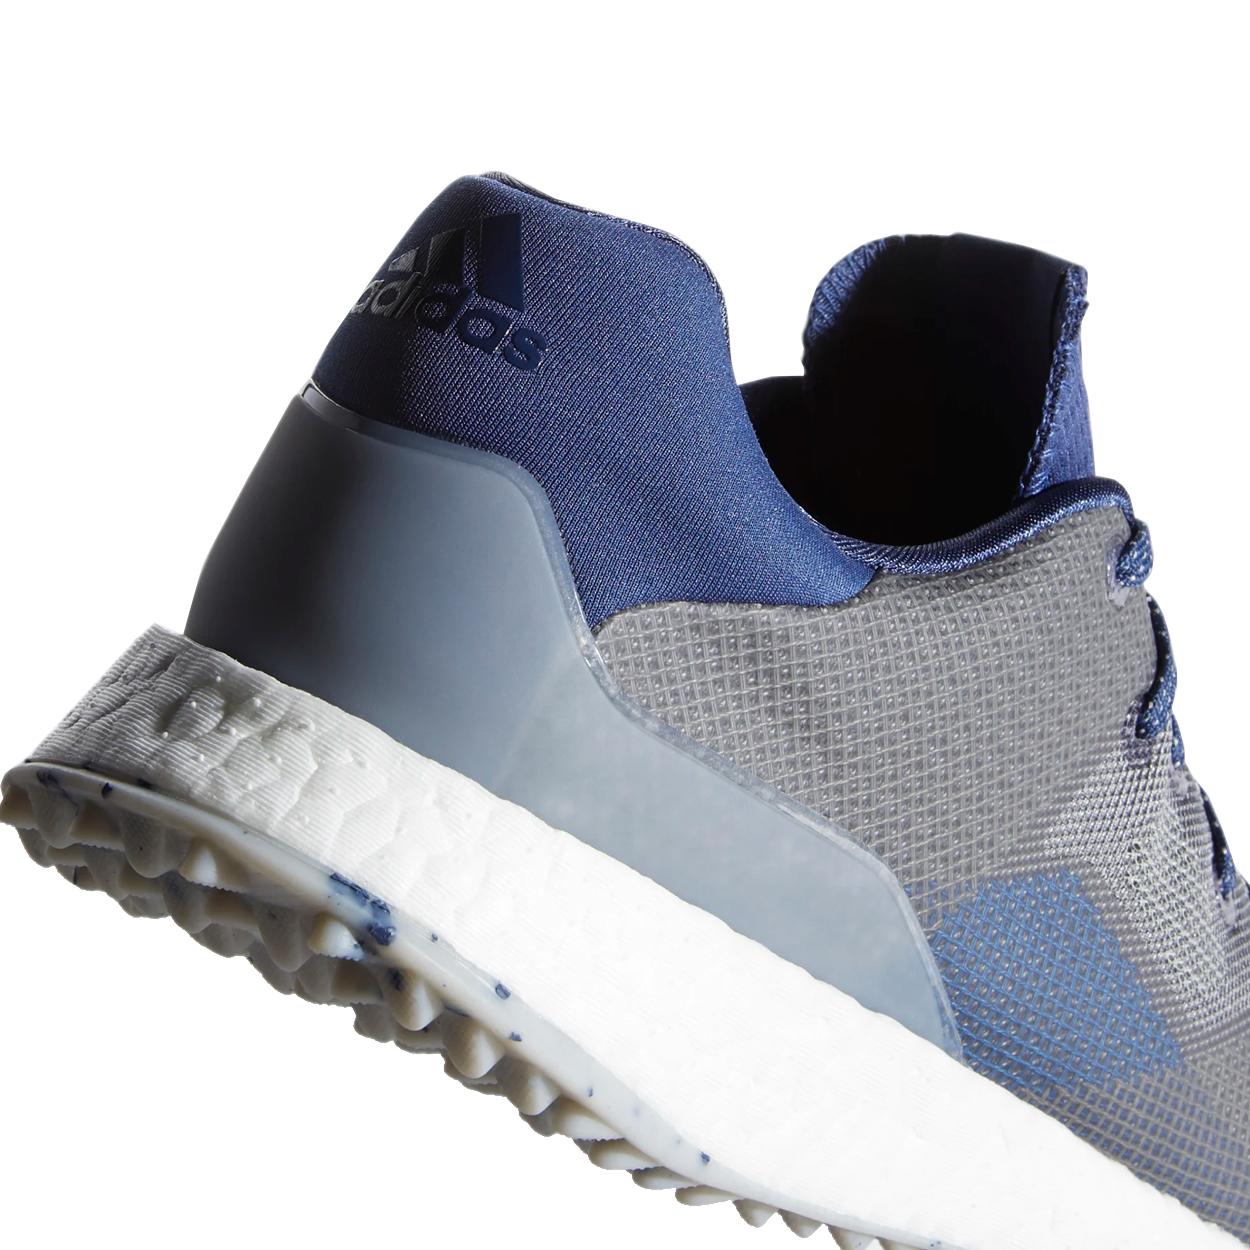 thumbnail 13 - Adidas Men's Crossknit DPR Spikeless Golf Shoes,  Brand New